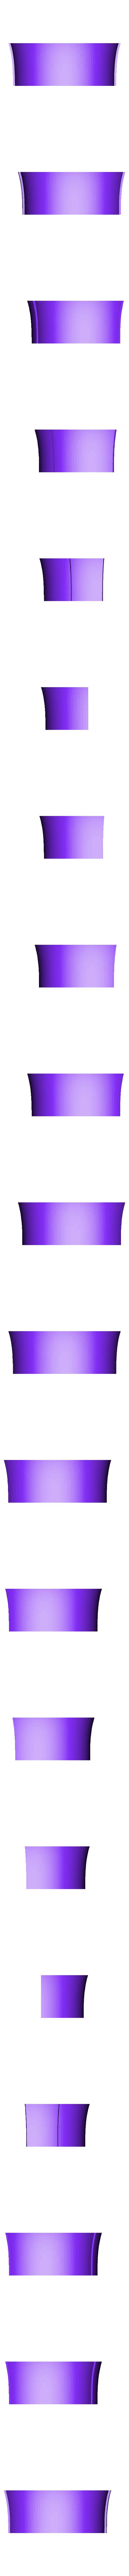 Breen_v3_part_6.stl Download free STL file Breen Helmet • 3D printer template, poblocki1982